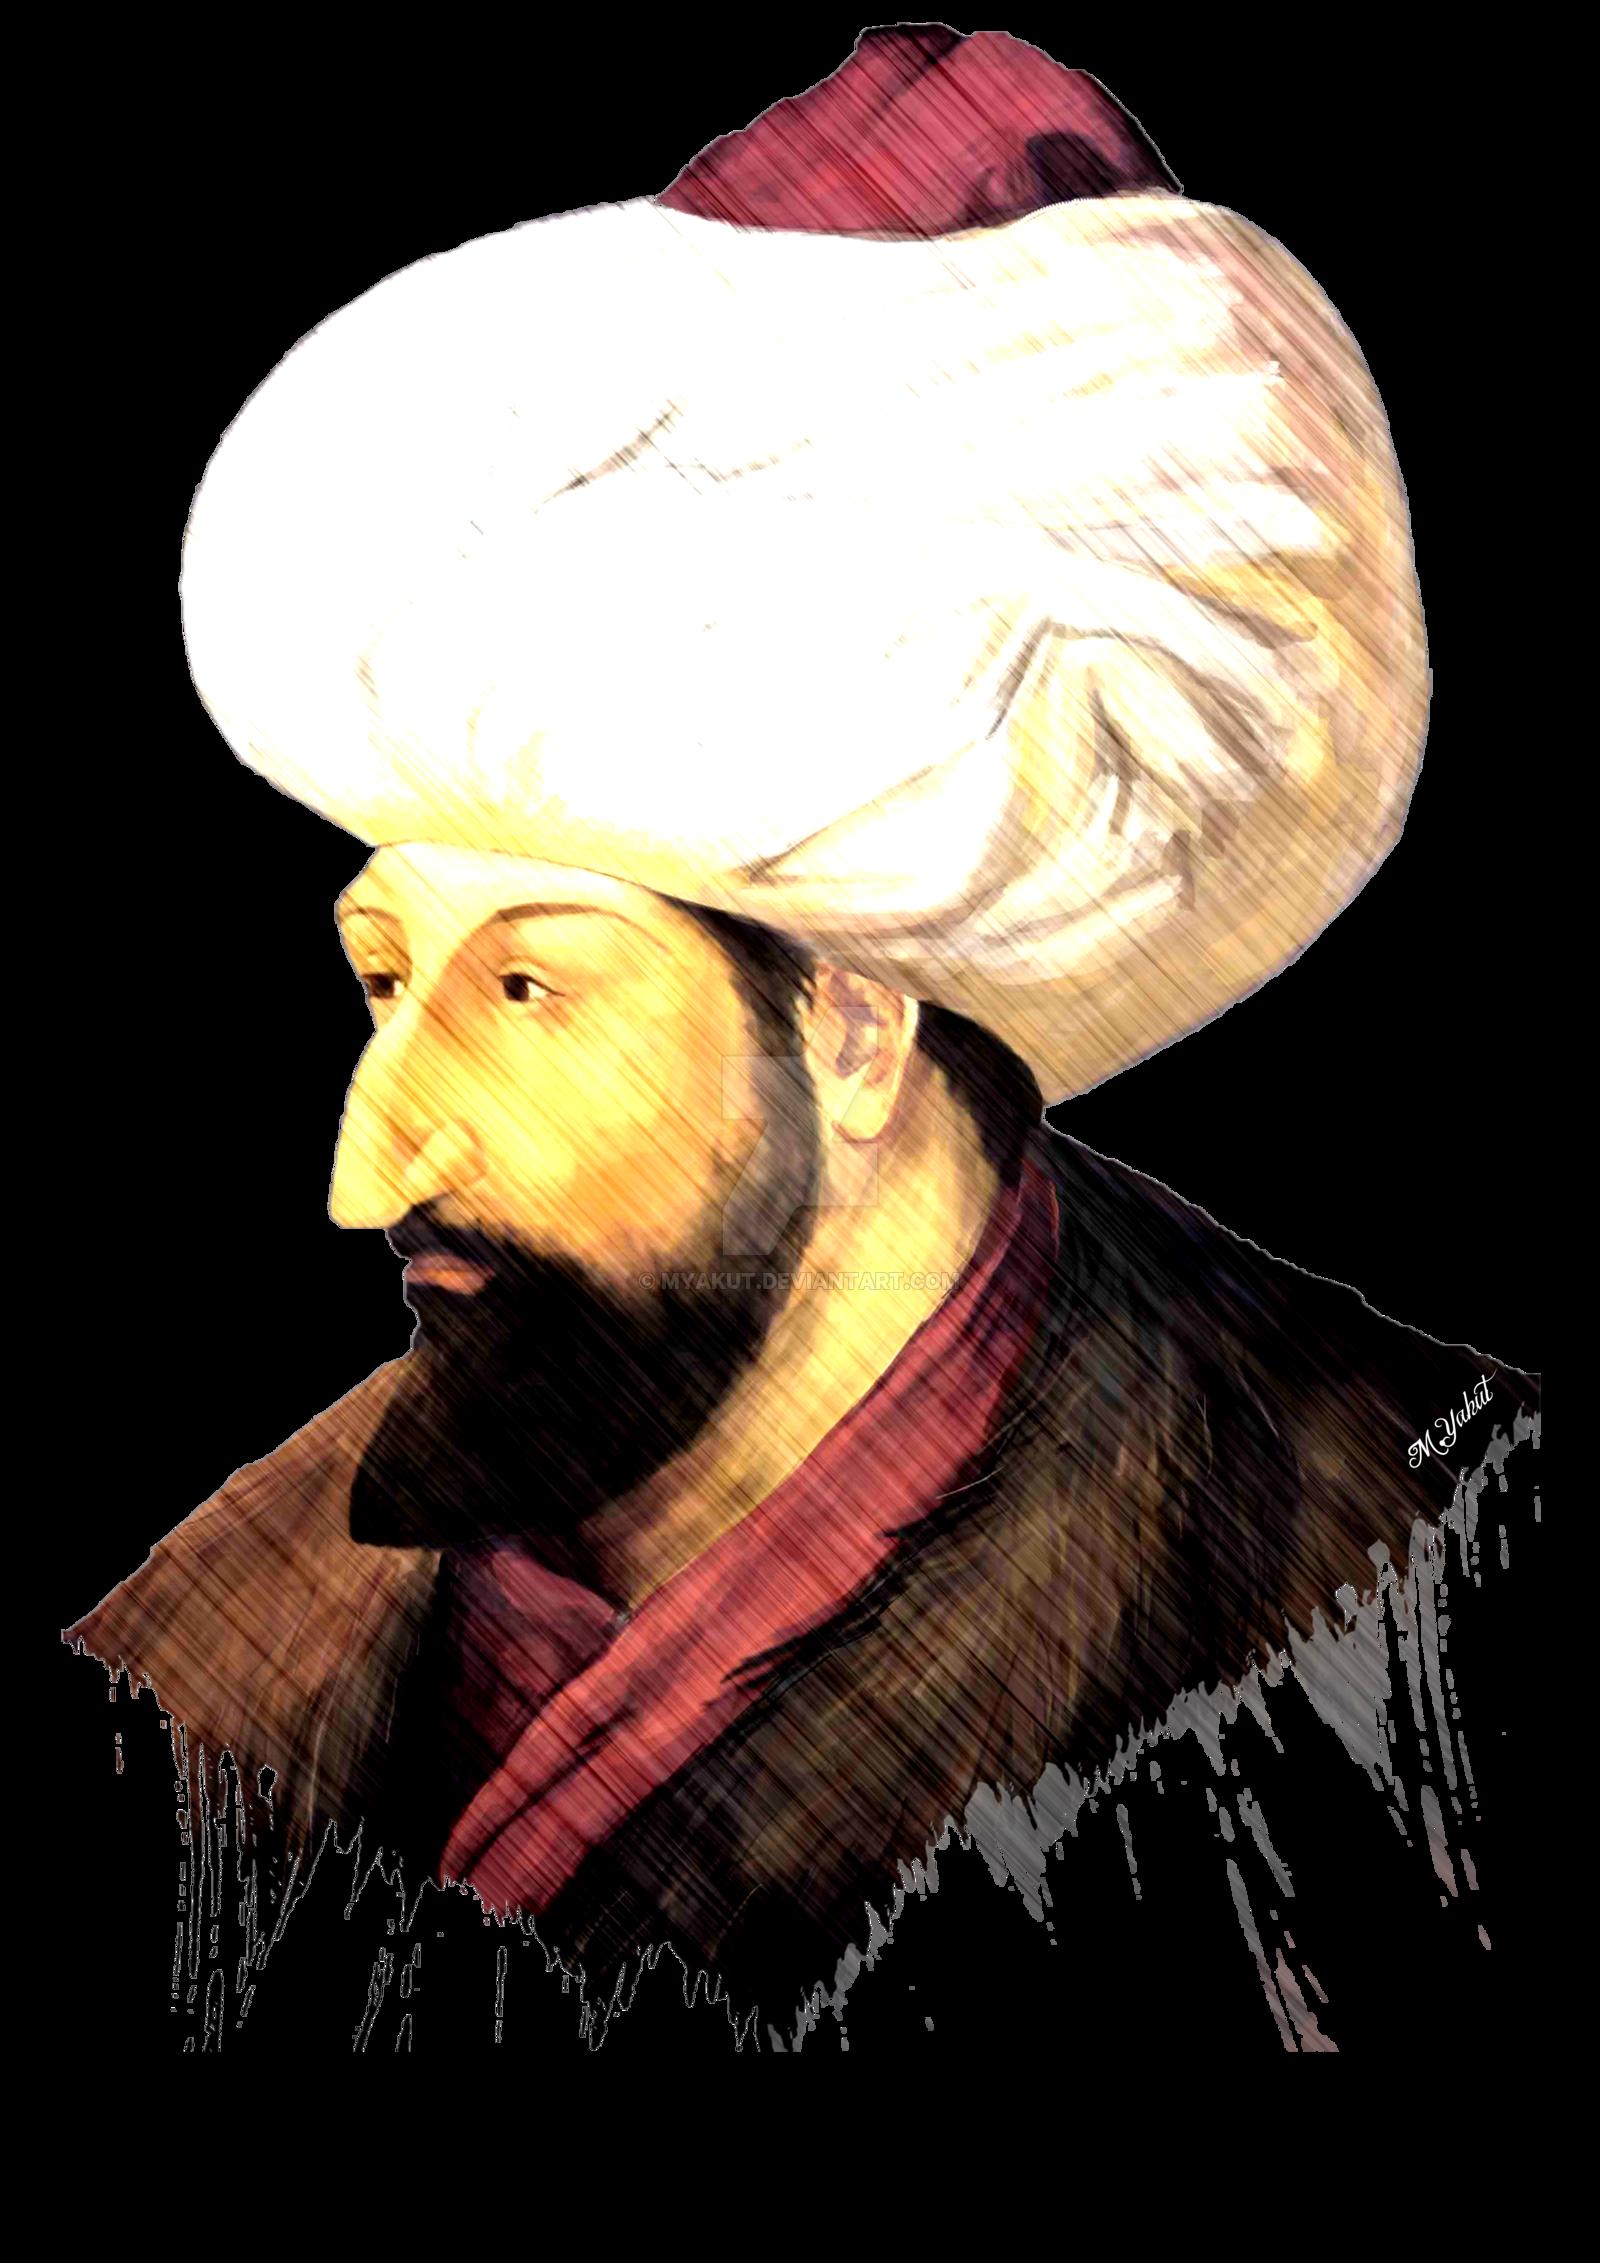 Fatih Sultan Mehmet by myakut on DeviantArt.